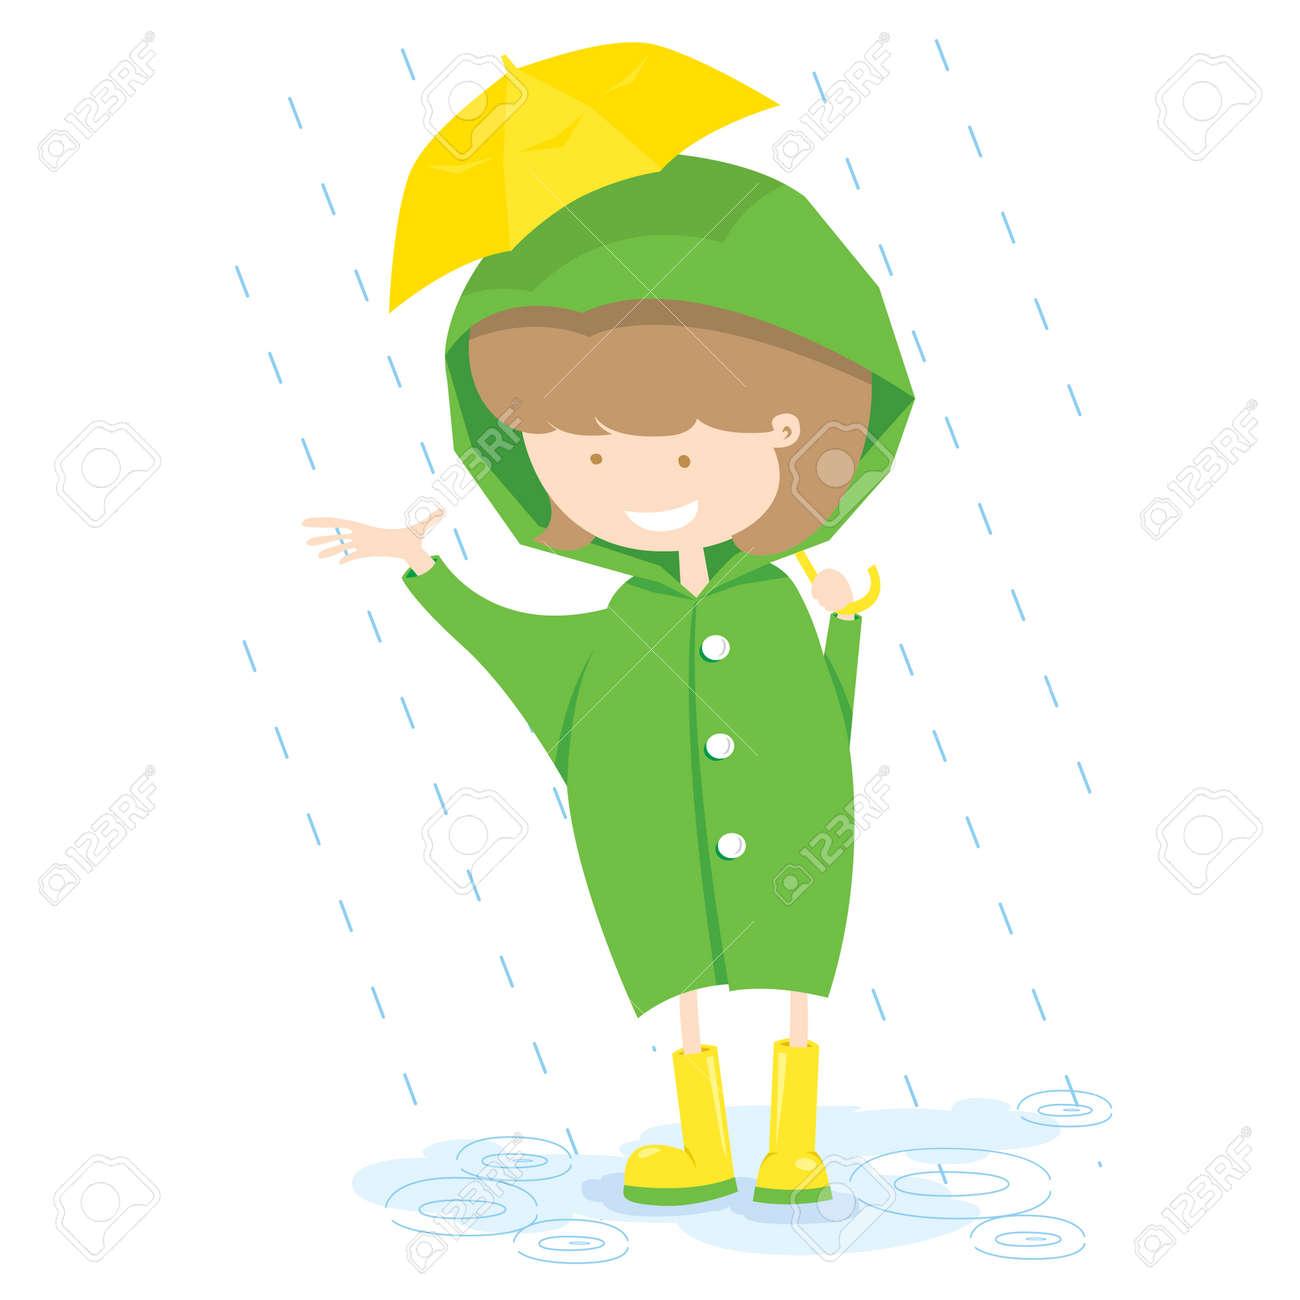 Little Girl In Rainy Day Vector Illustration Stock Vector - 22639361